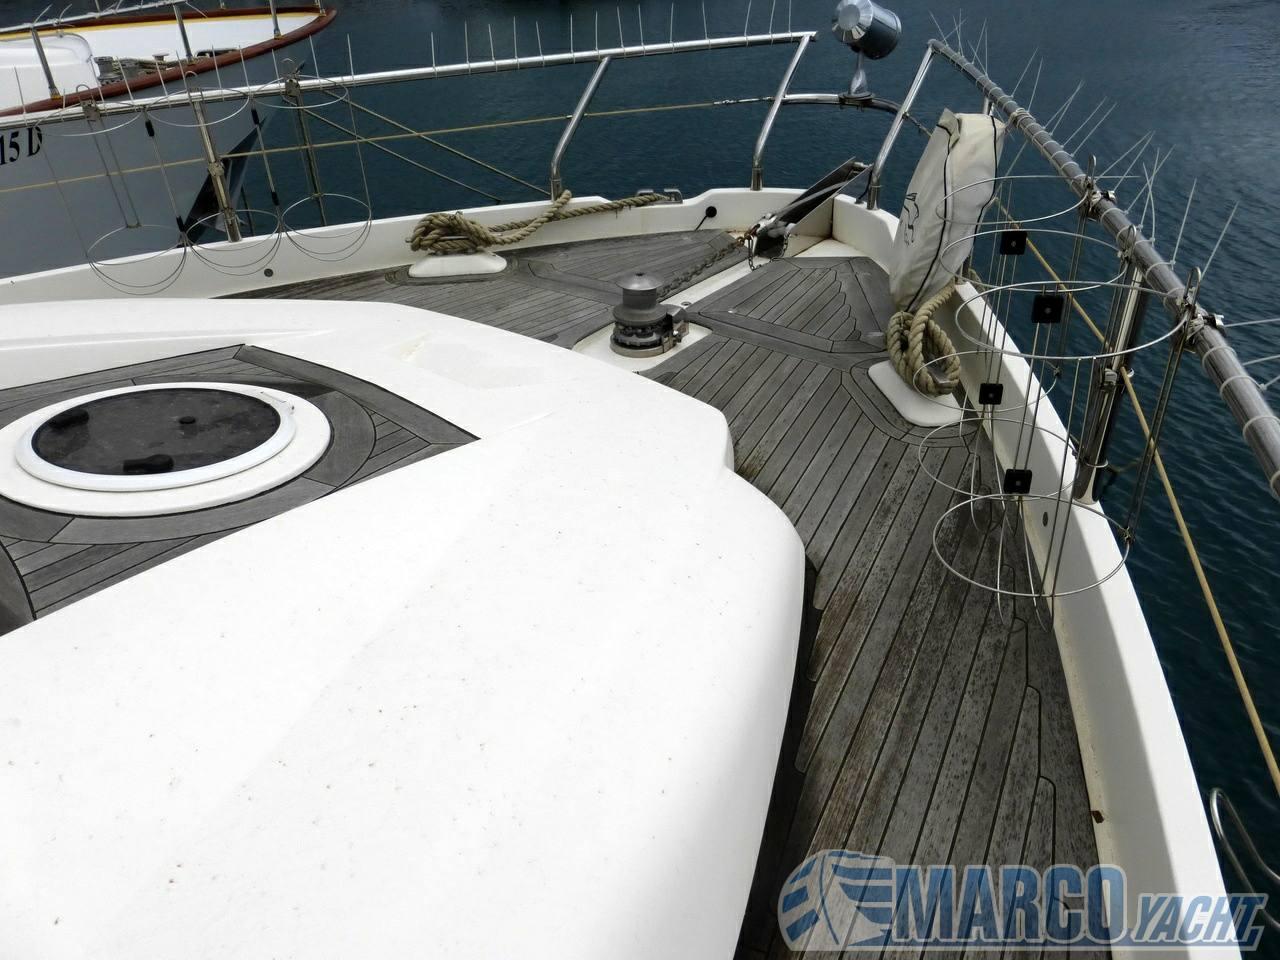 Aicon yachts 72 ht